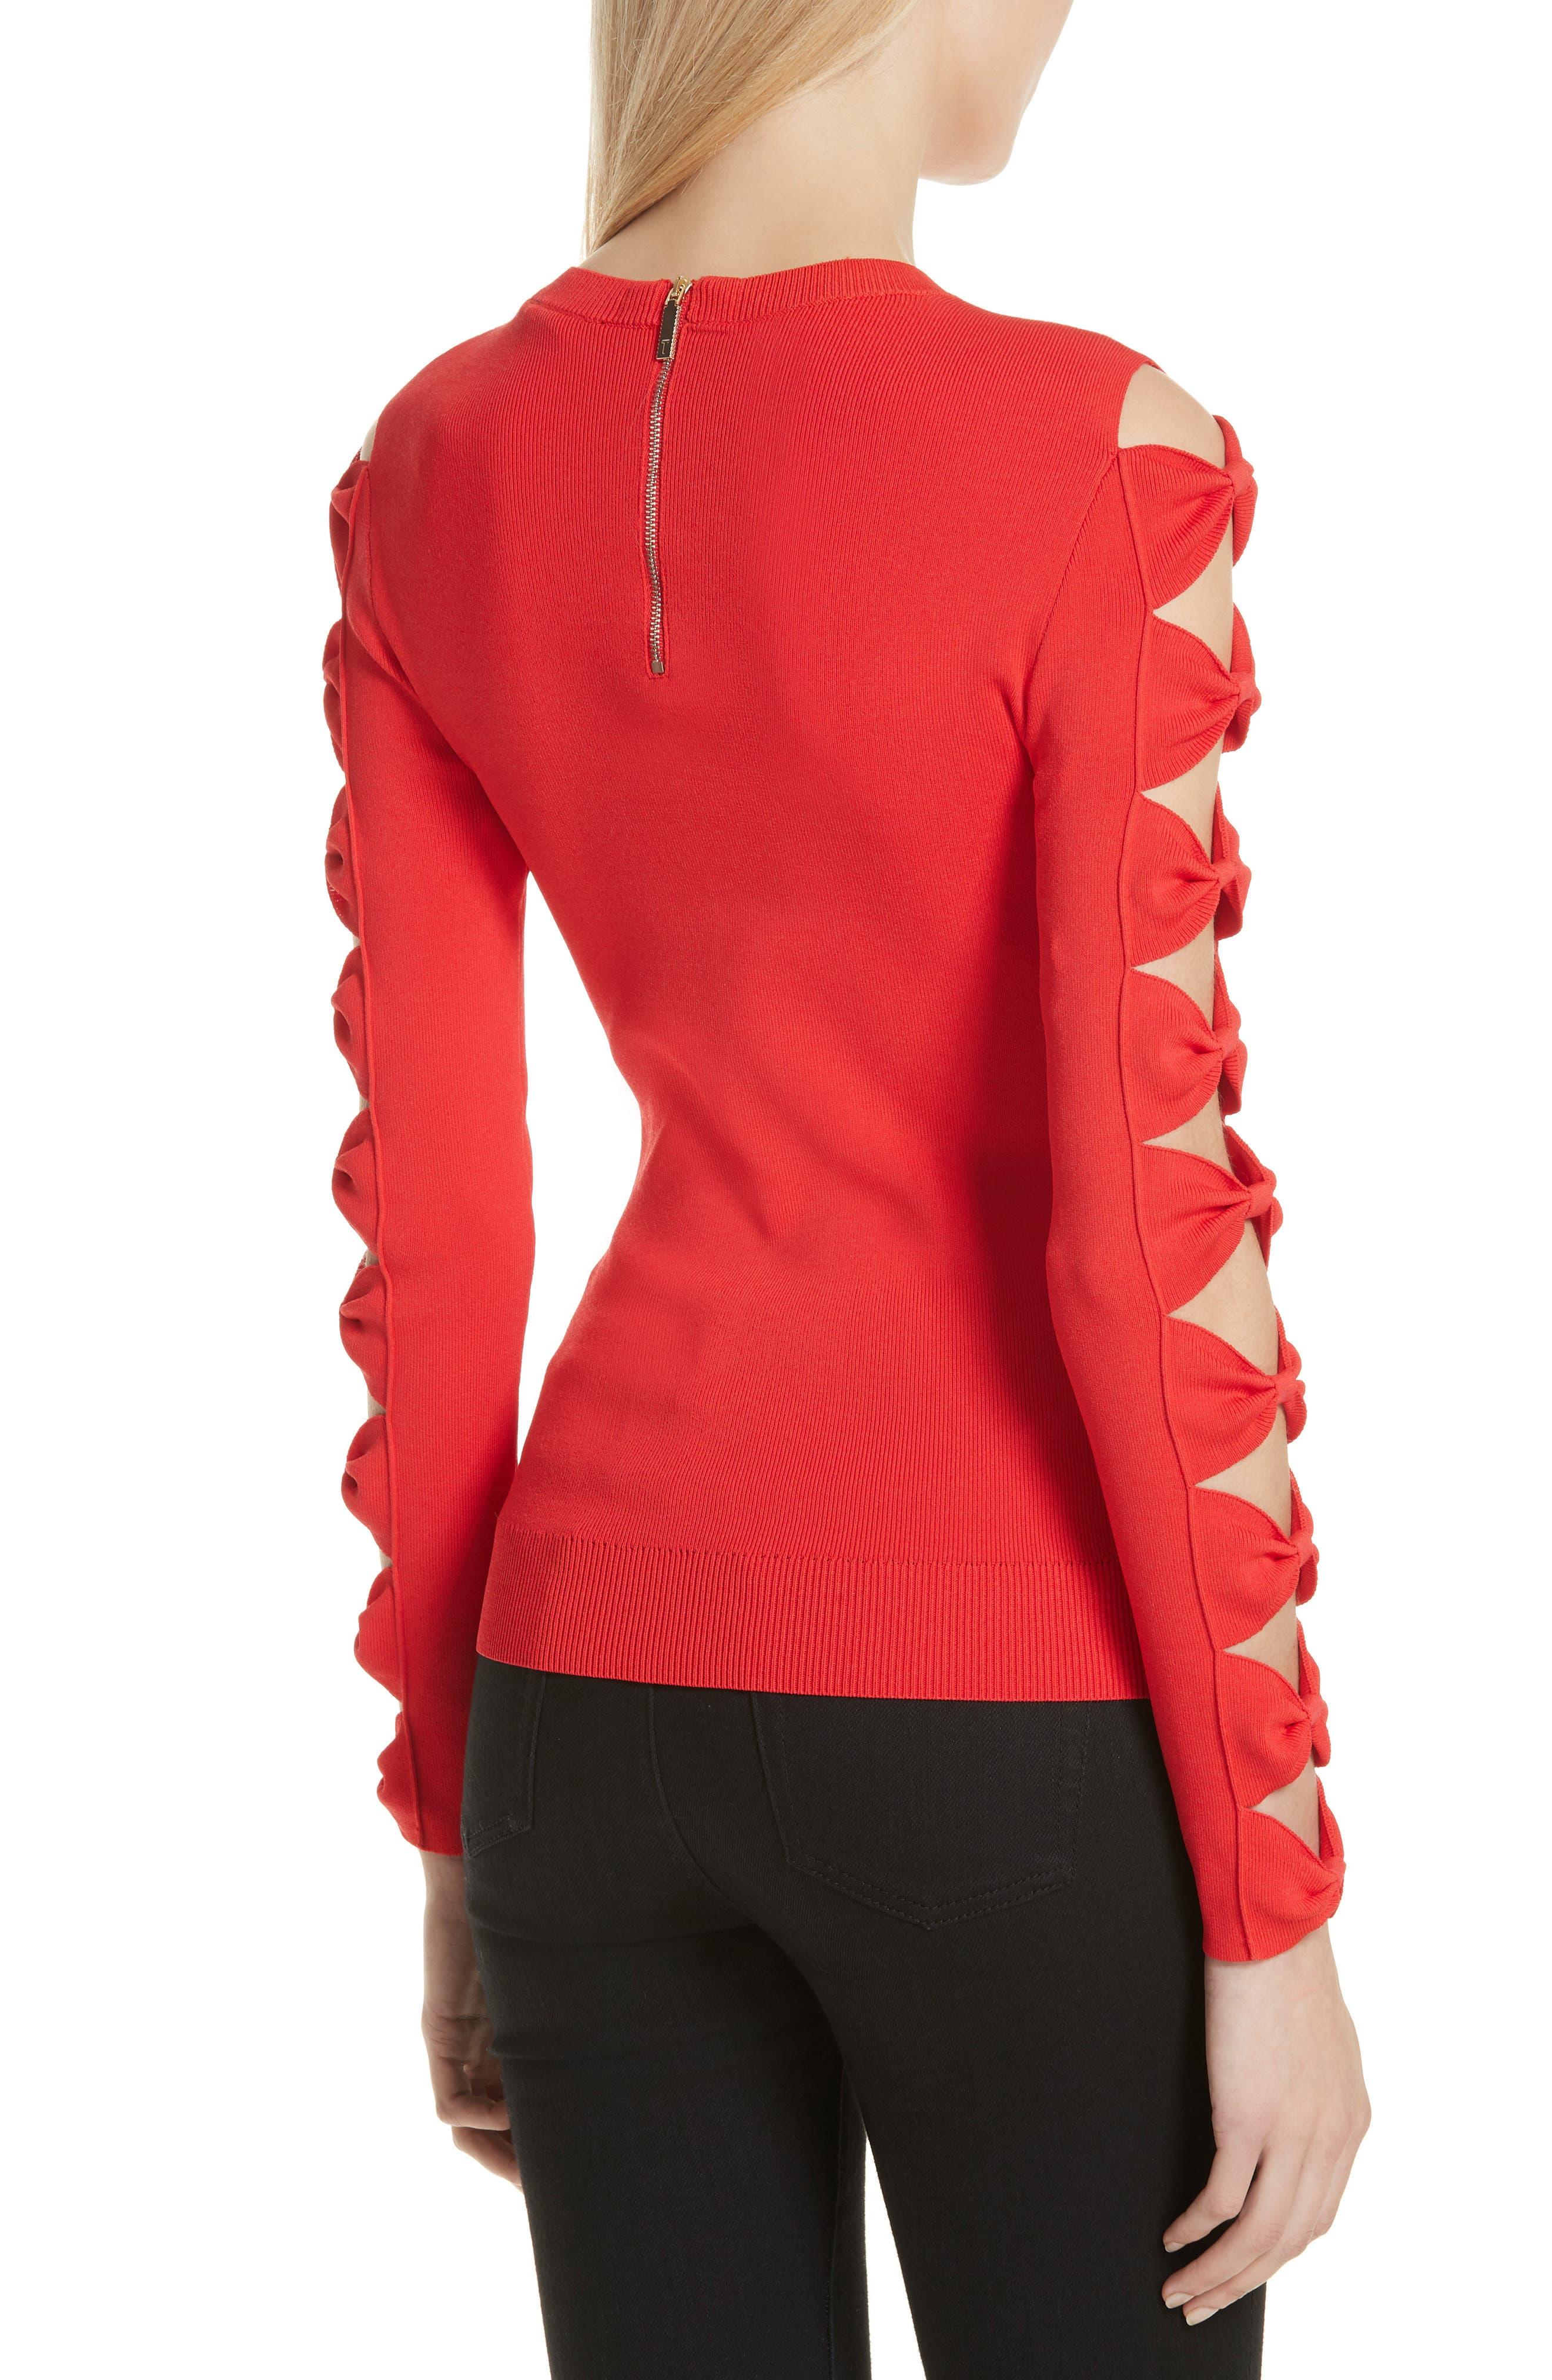 Yonoh Cutout Sleeve Sweater,                             Alternate thumbnail 2, color,                             600